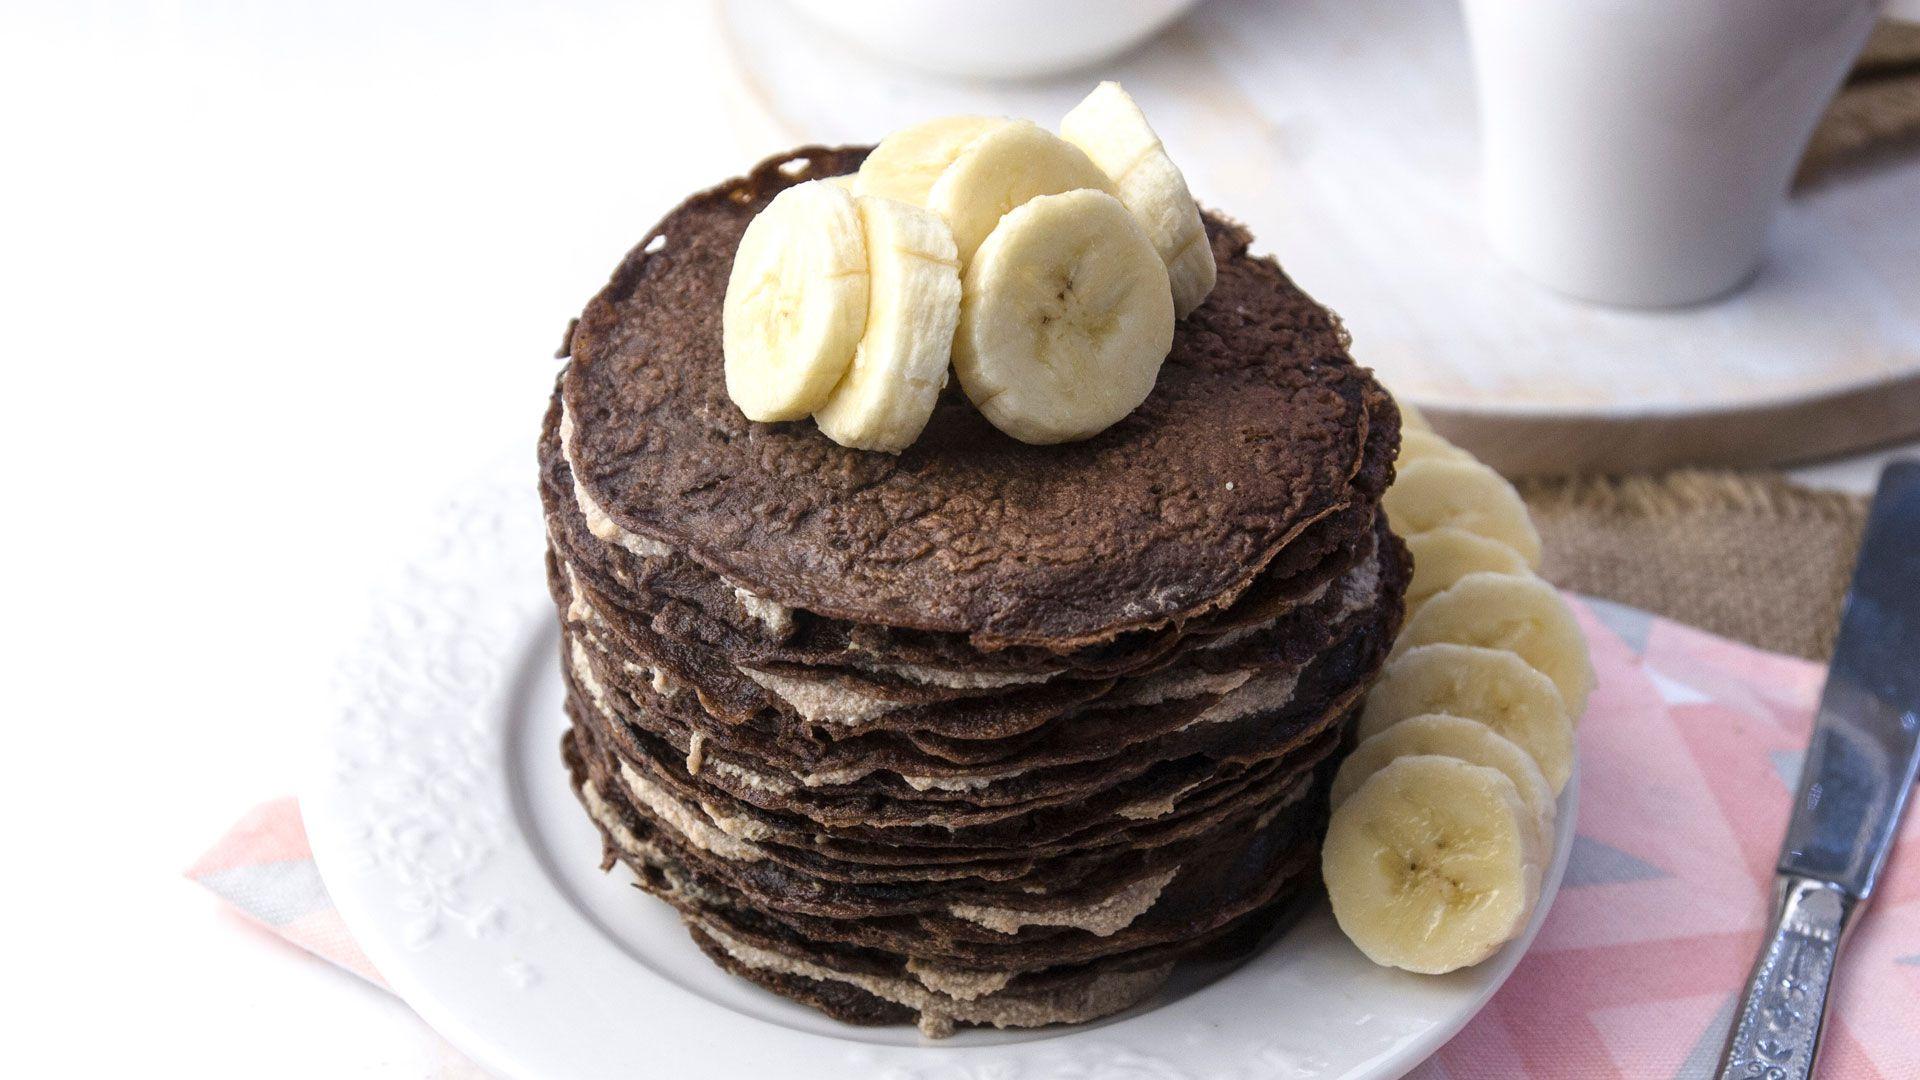 Los mini pancakes integrales de algarroba con decoración de banana (Shutterstock)